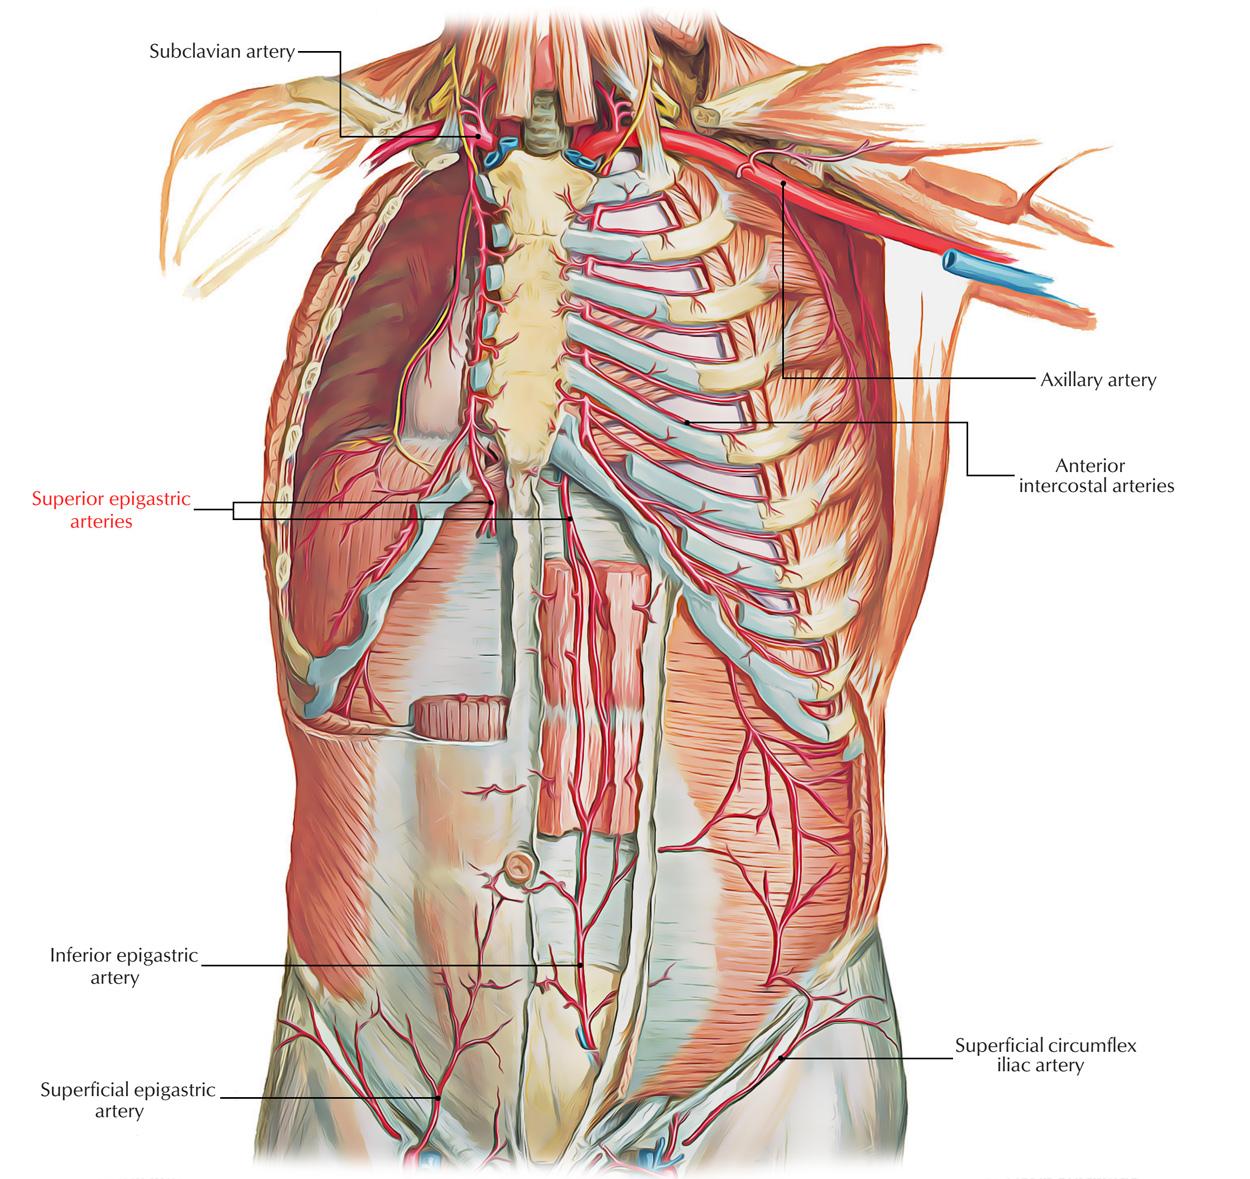 hight resolution of vascular diagram of neck